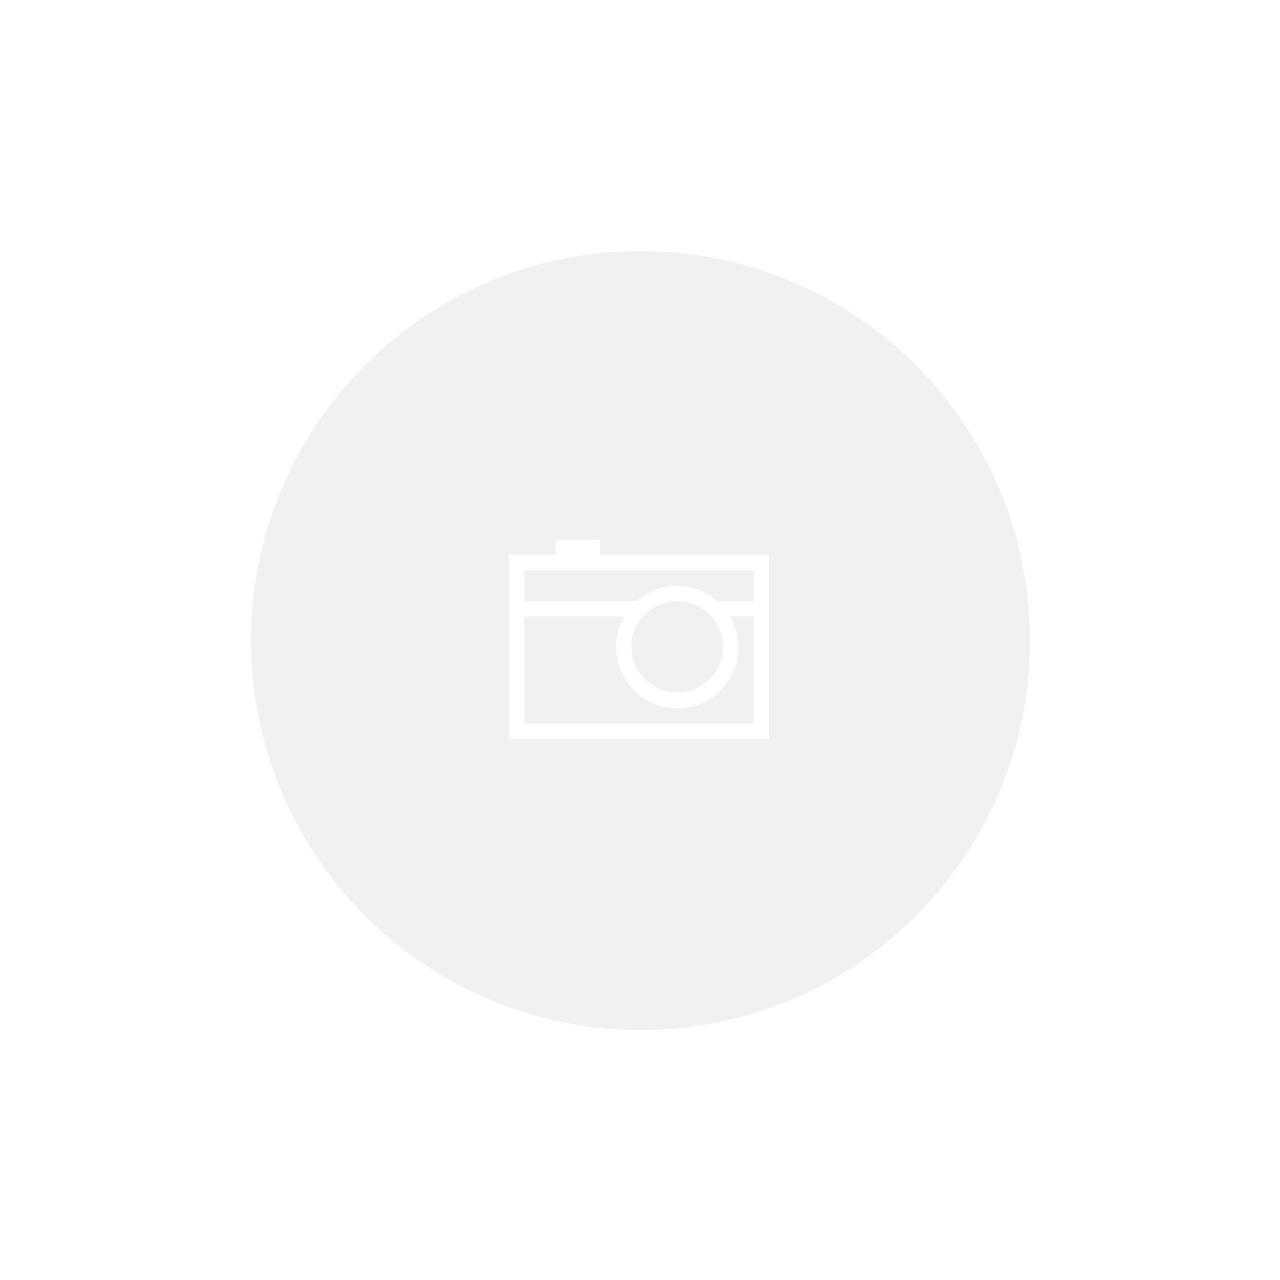 COROA 36D ICTUS NARROW WIDE ASSIMÉTRICA BCD 96mm (12V)